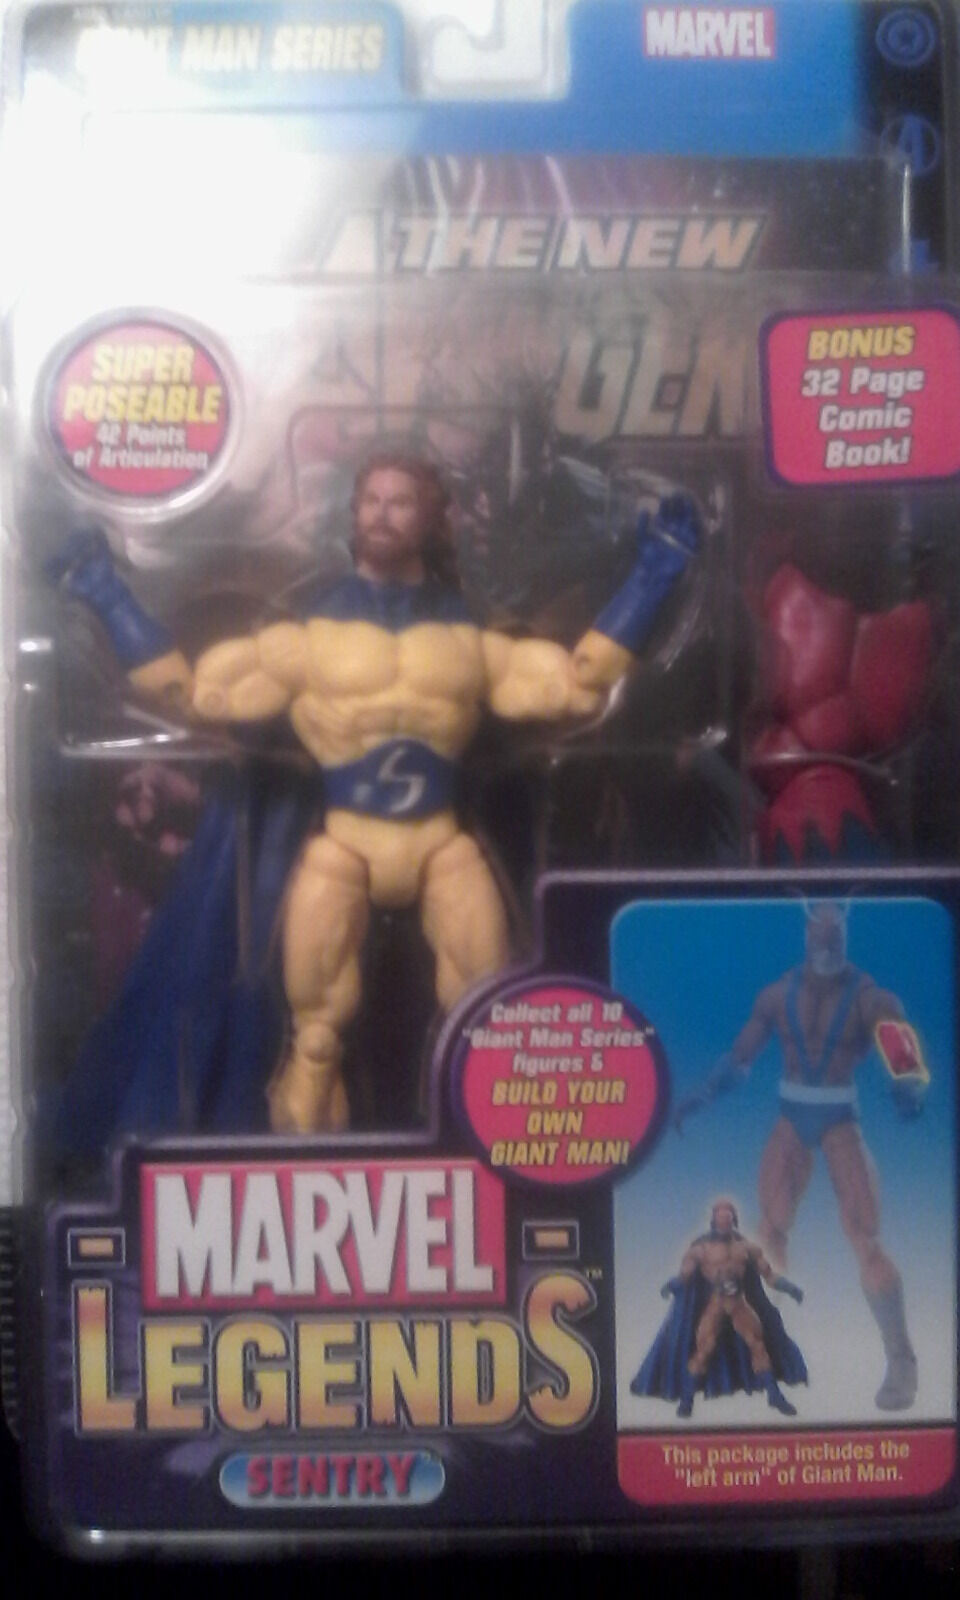 Toybiz Toy Biz Marvel Legends Sentry variant bearded Giant Man series